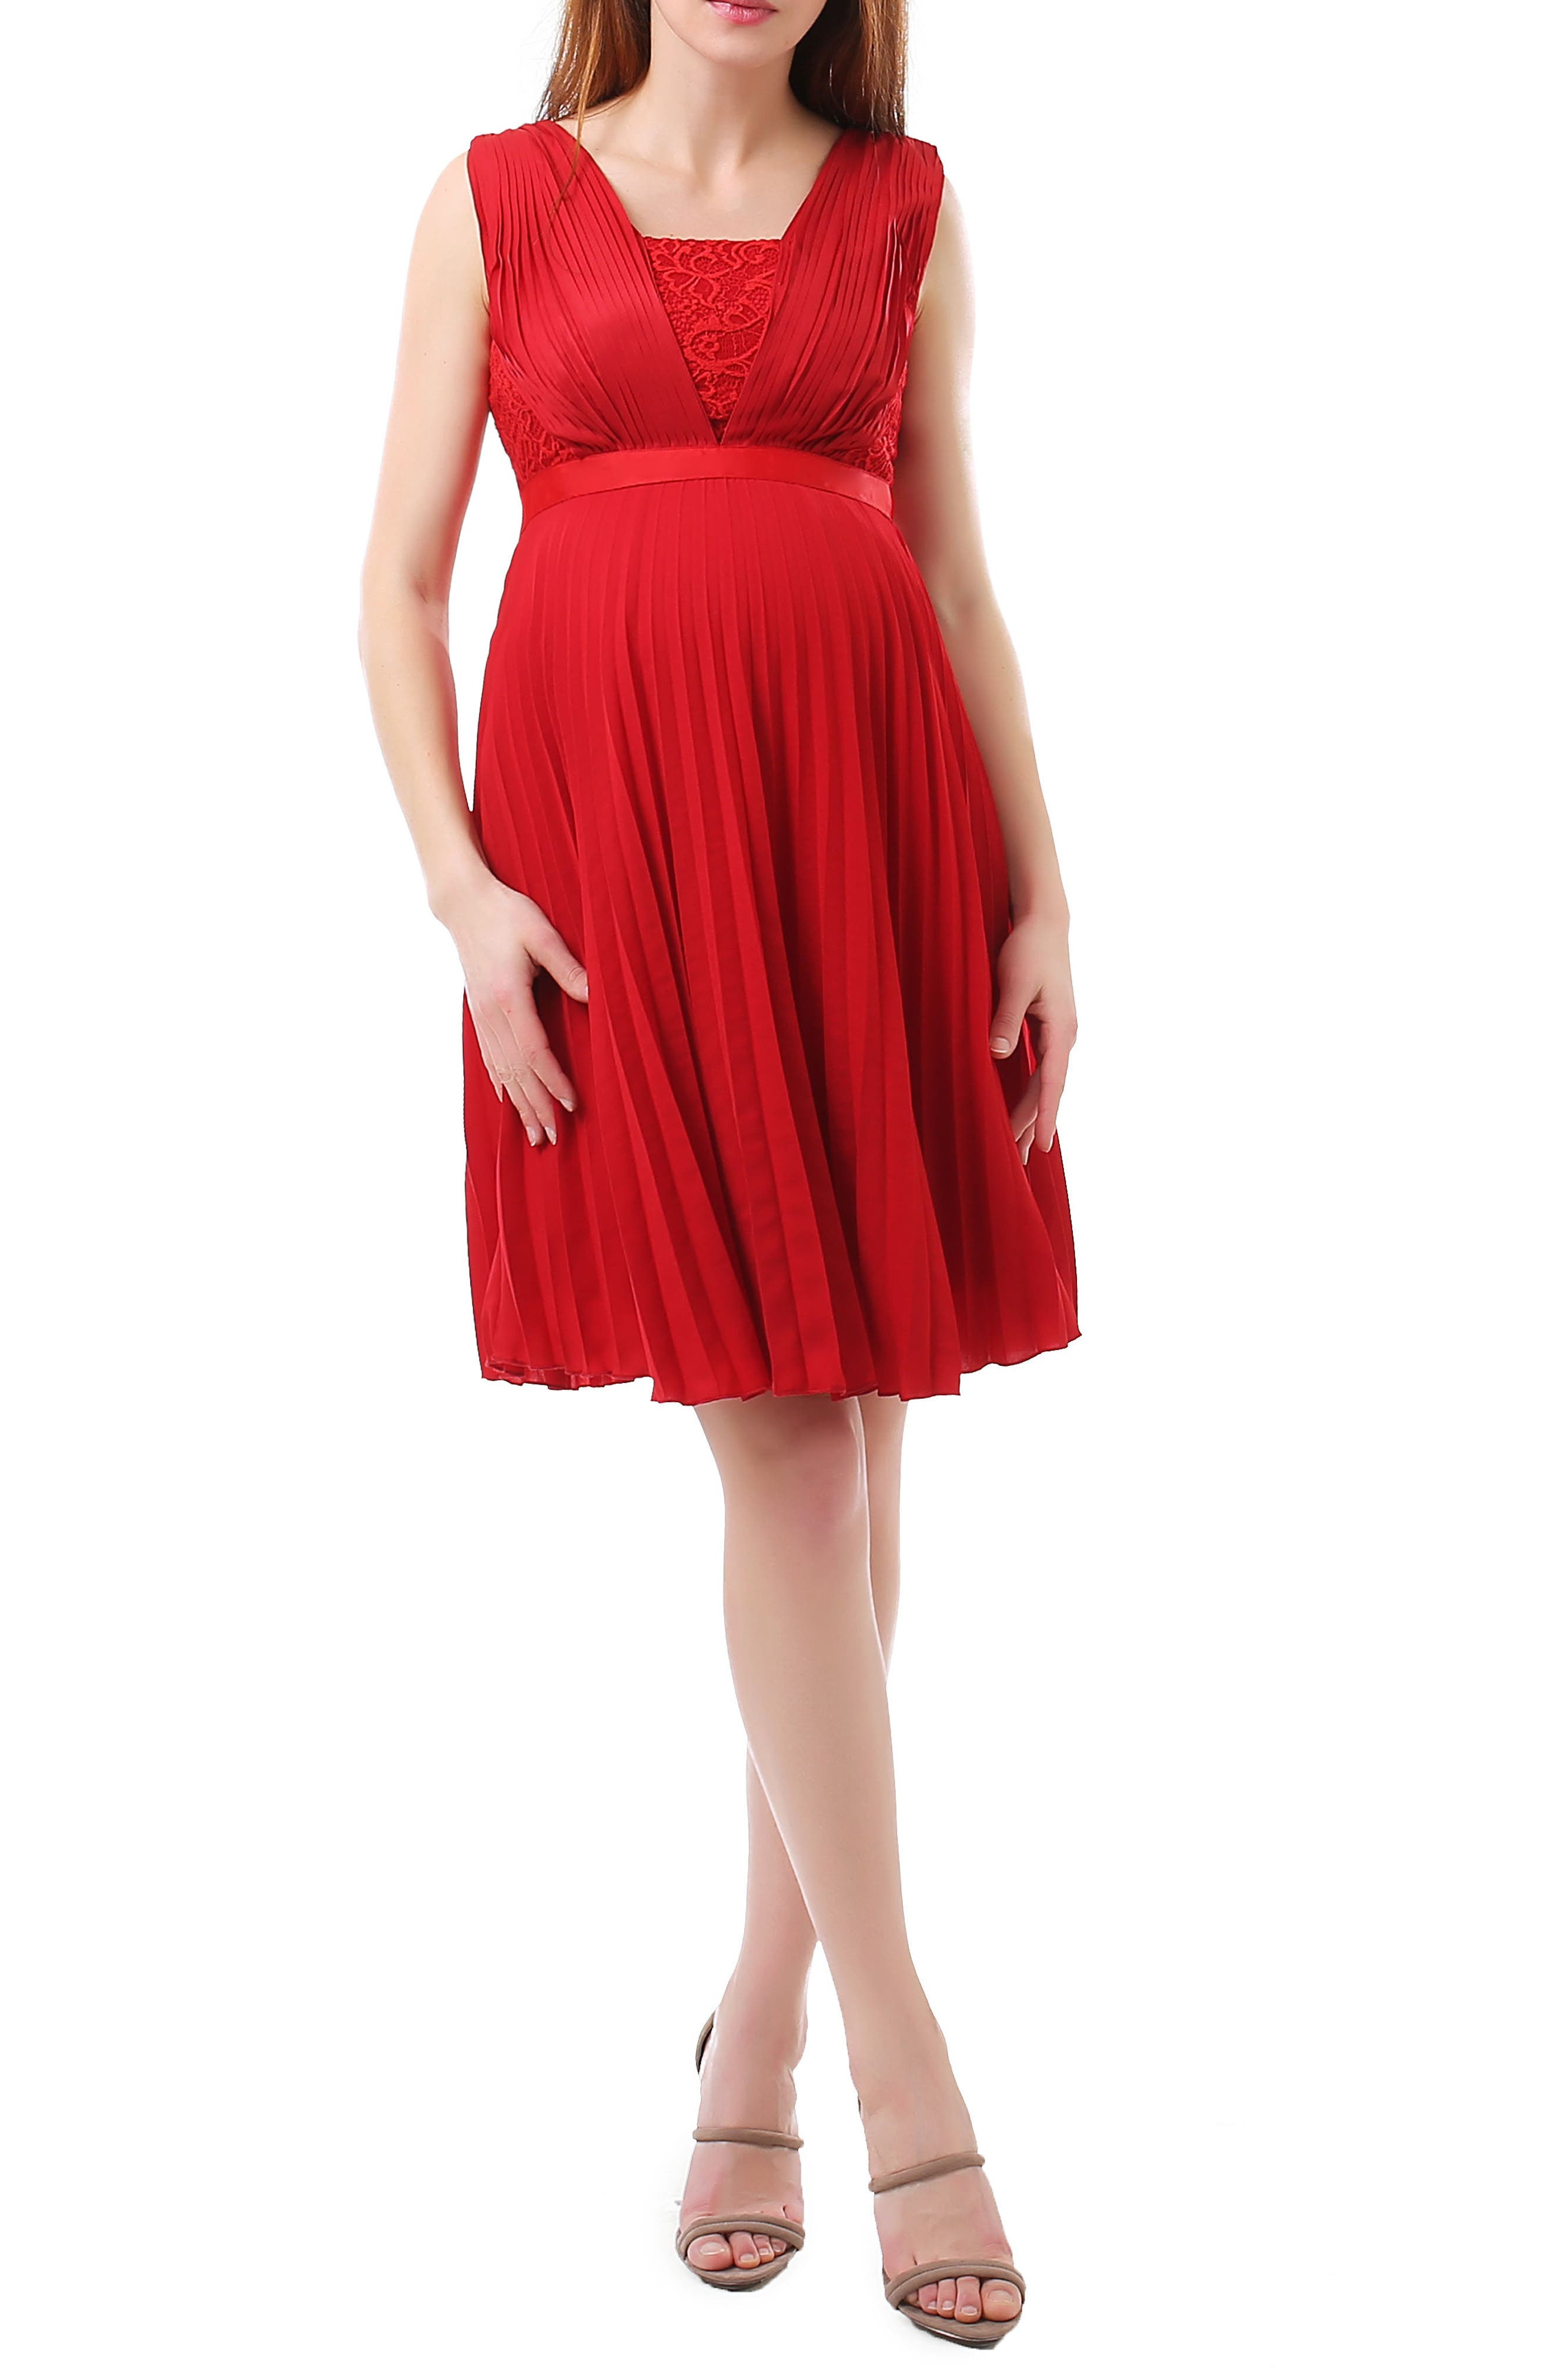 Lauren Chiffon & Lace Maternity Dress,                             Main thumbnail 1, color,                             RED